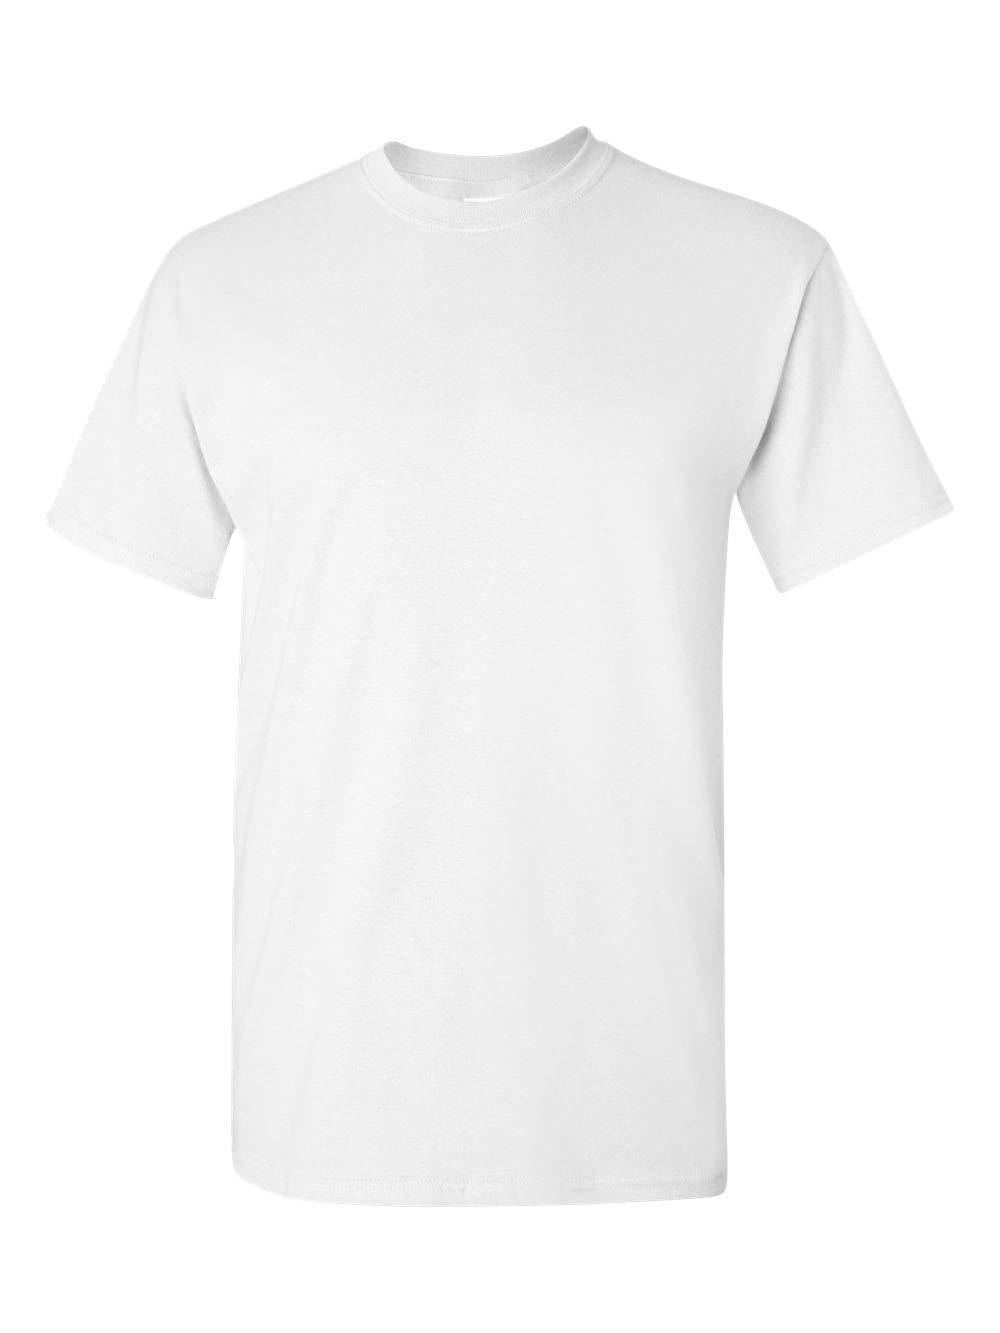 Gildan Men's Heavy Cotton Tee (Pack of 12), White, Large